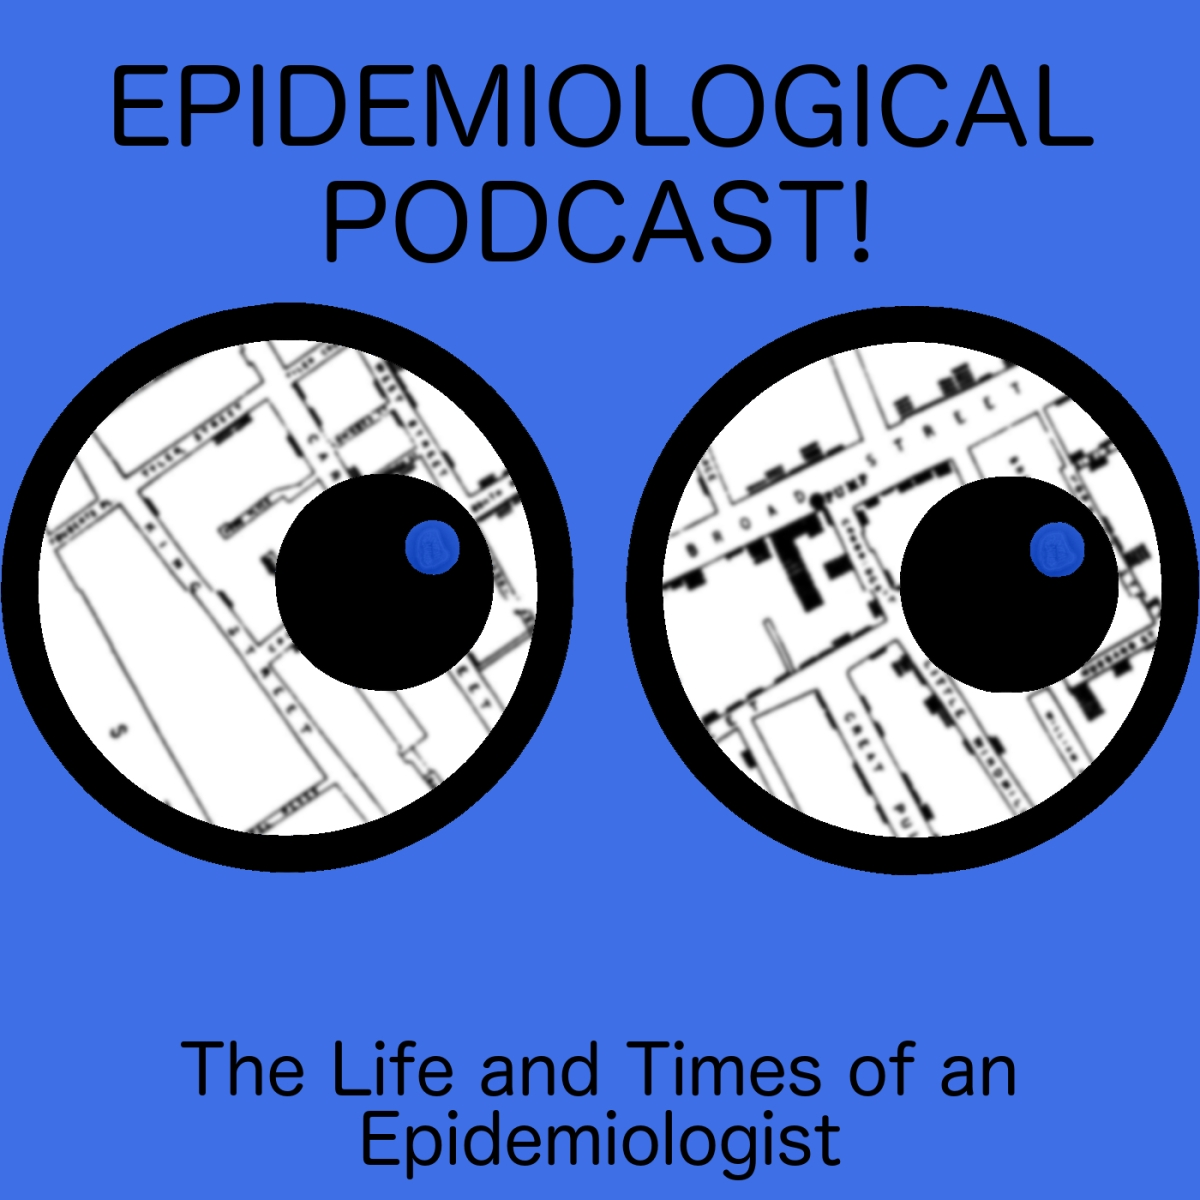 Epi_Podcast_Cover